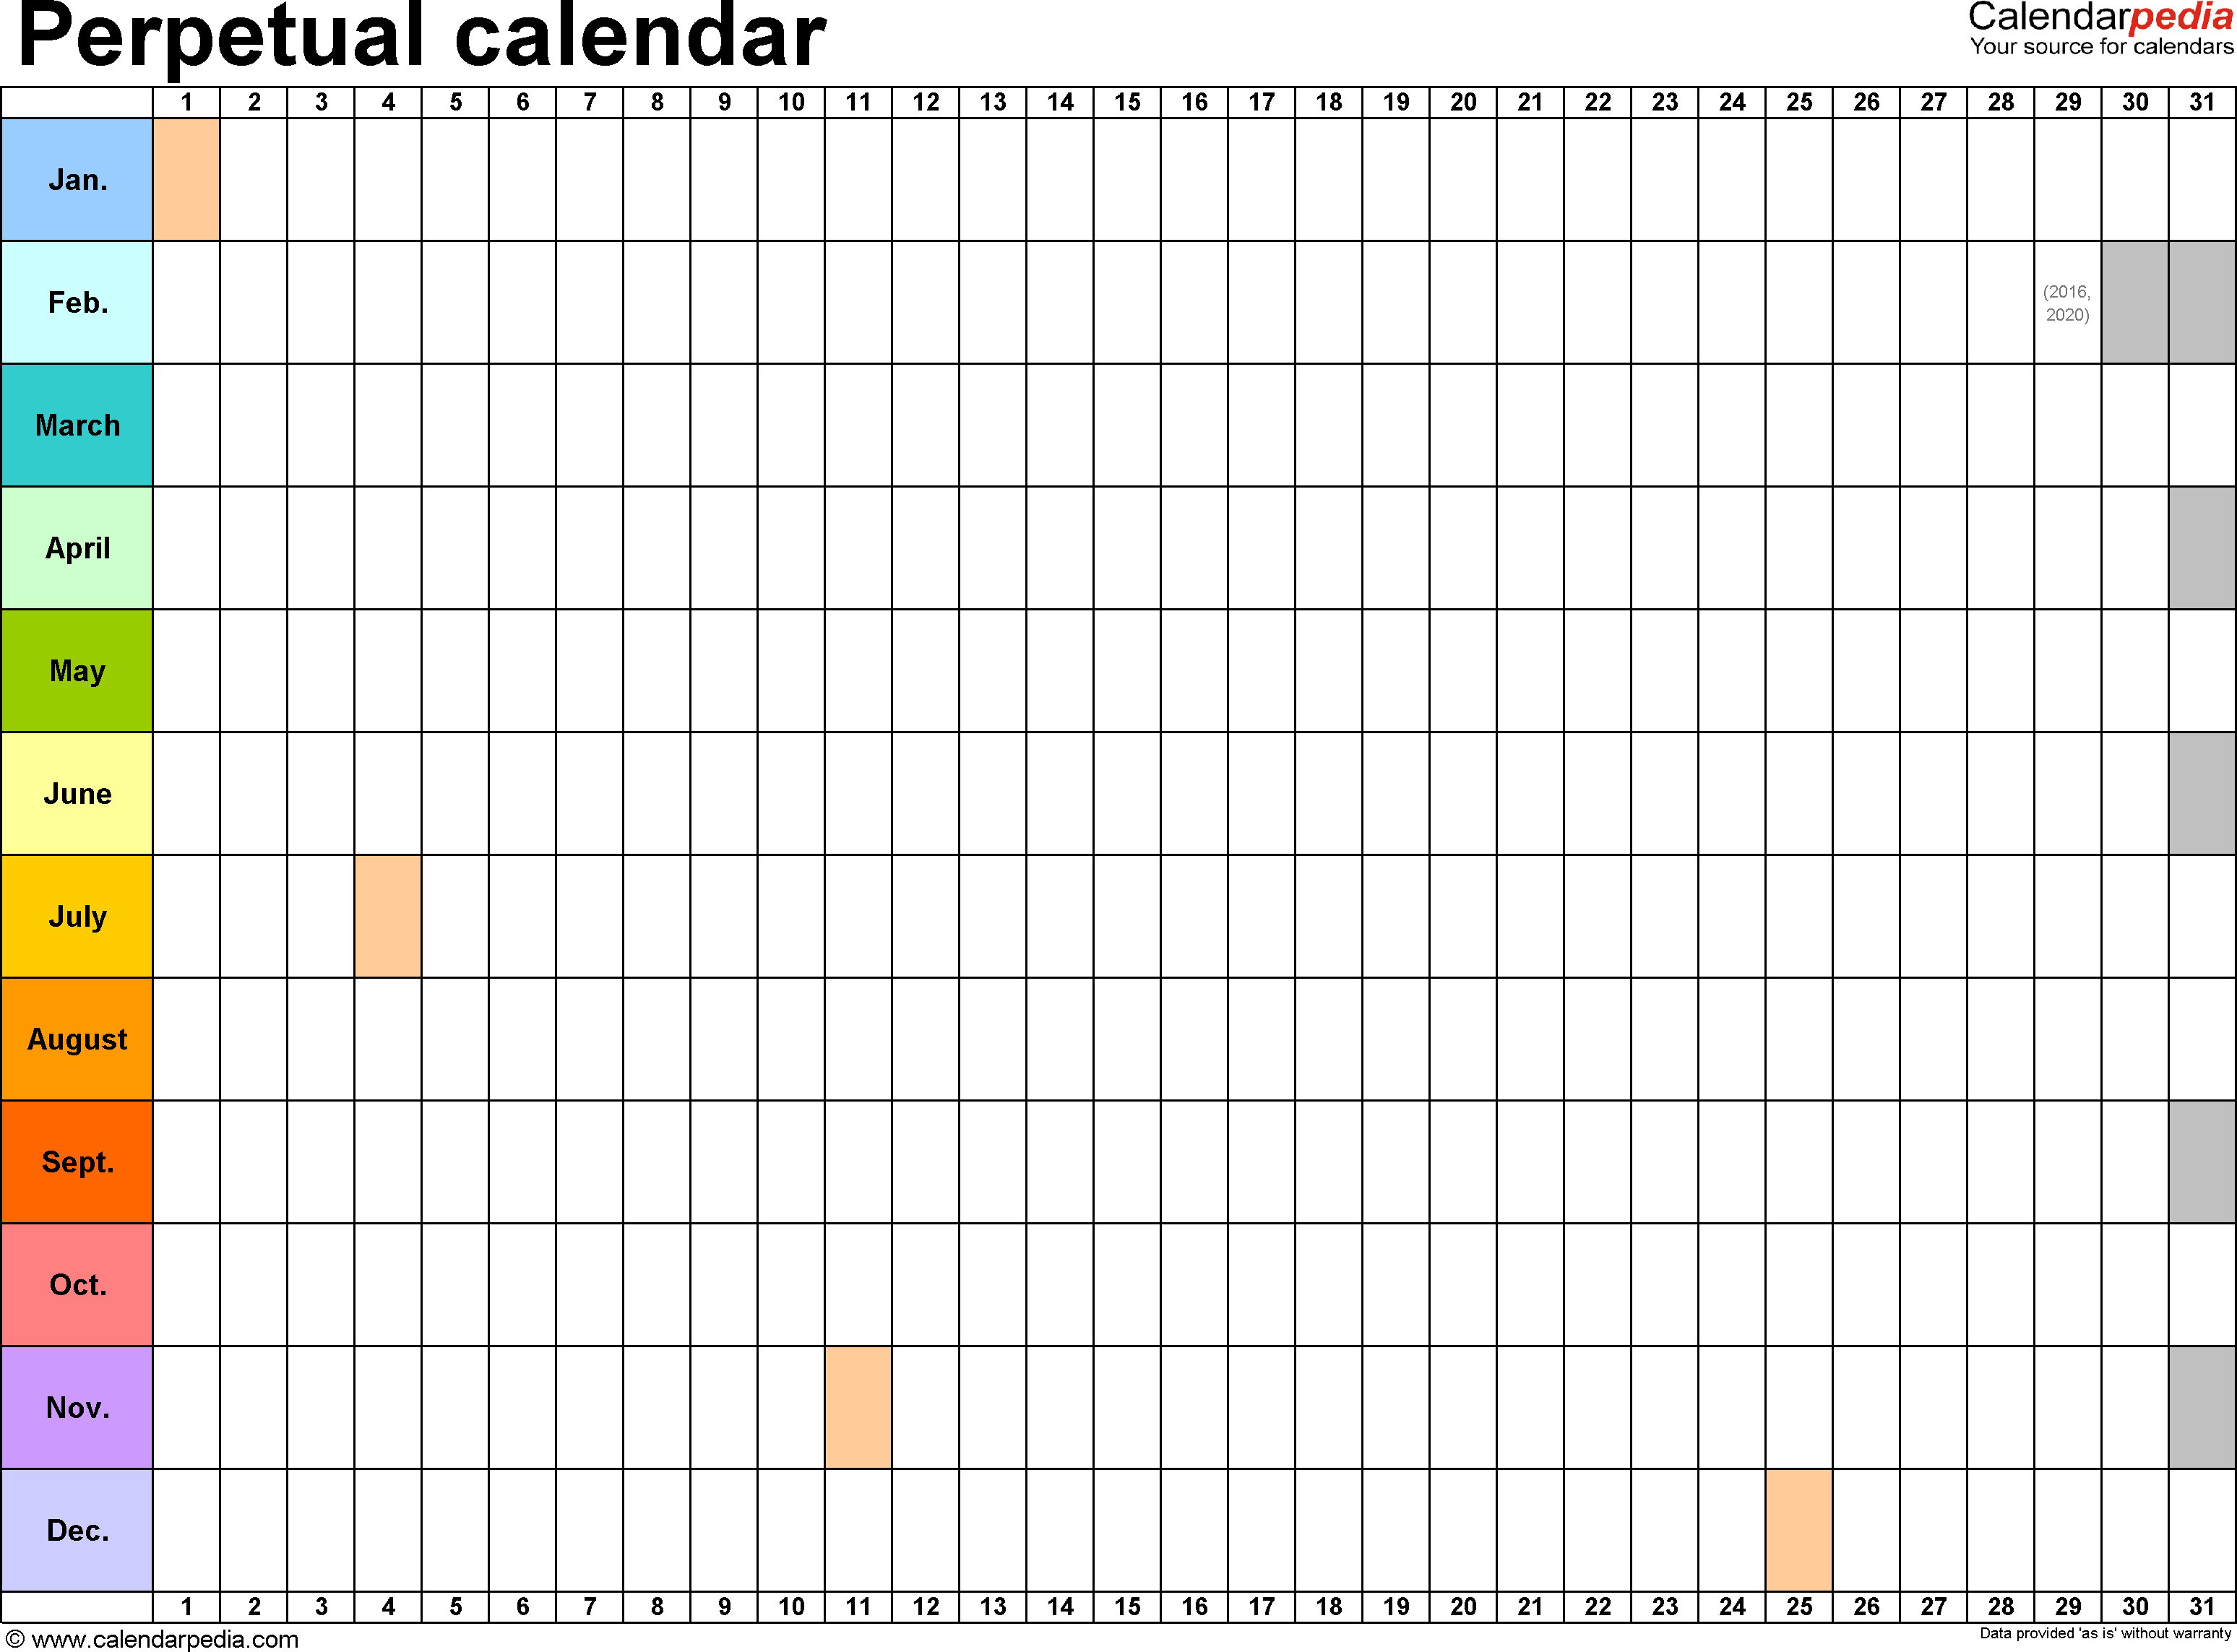 Free Calendar Template For Mac - Erha.yasamayolver